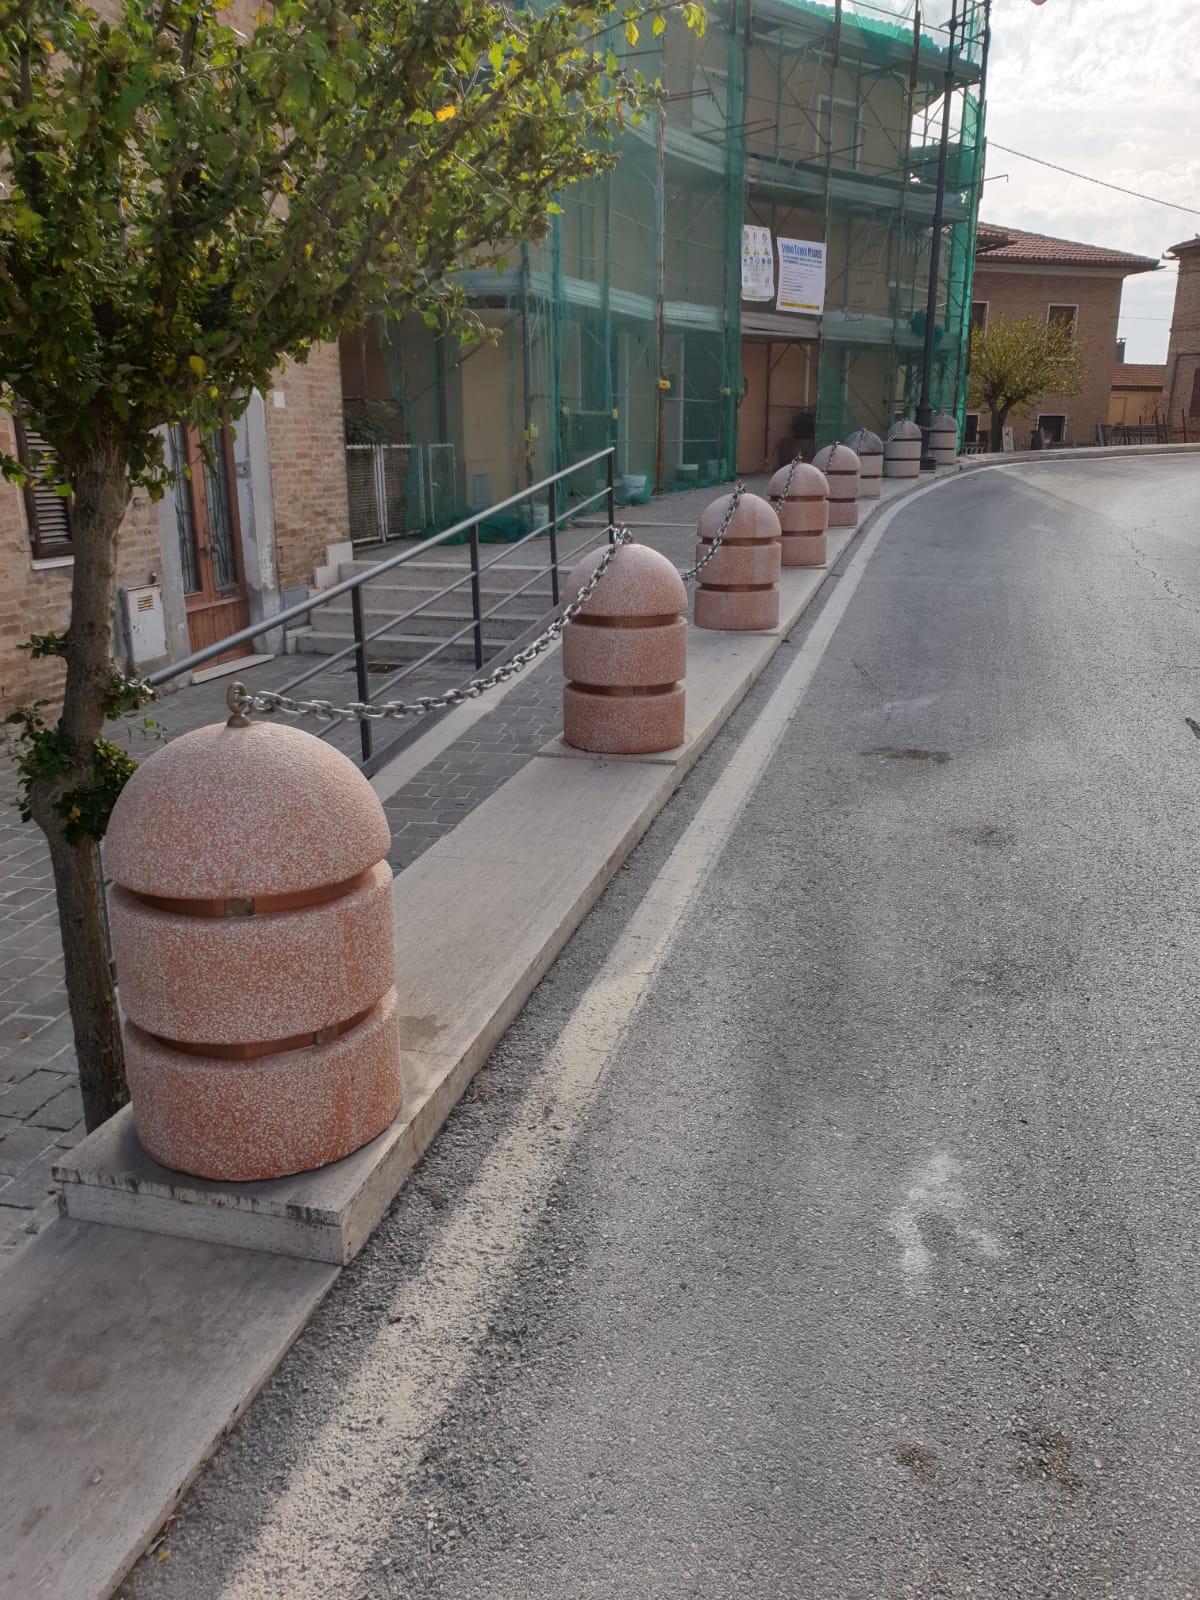 Ripristino arredo urbano post incidente Osimo (Ancona) - dopo